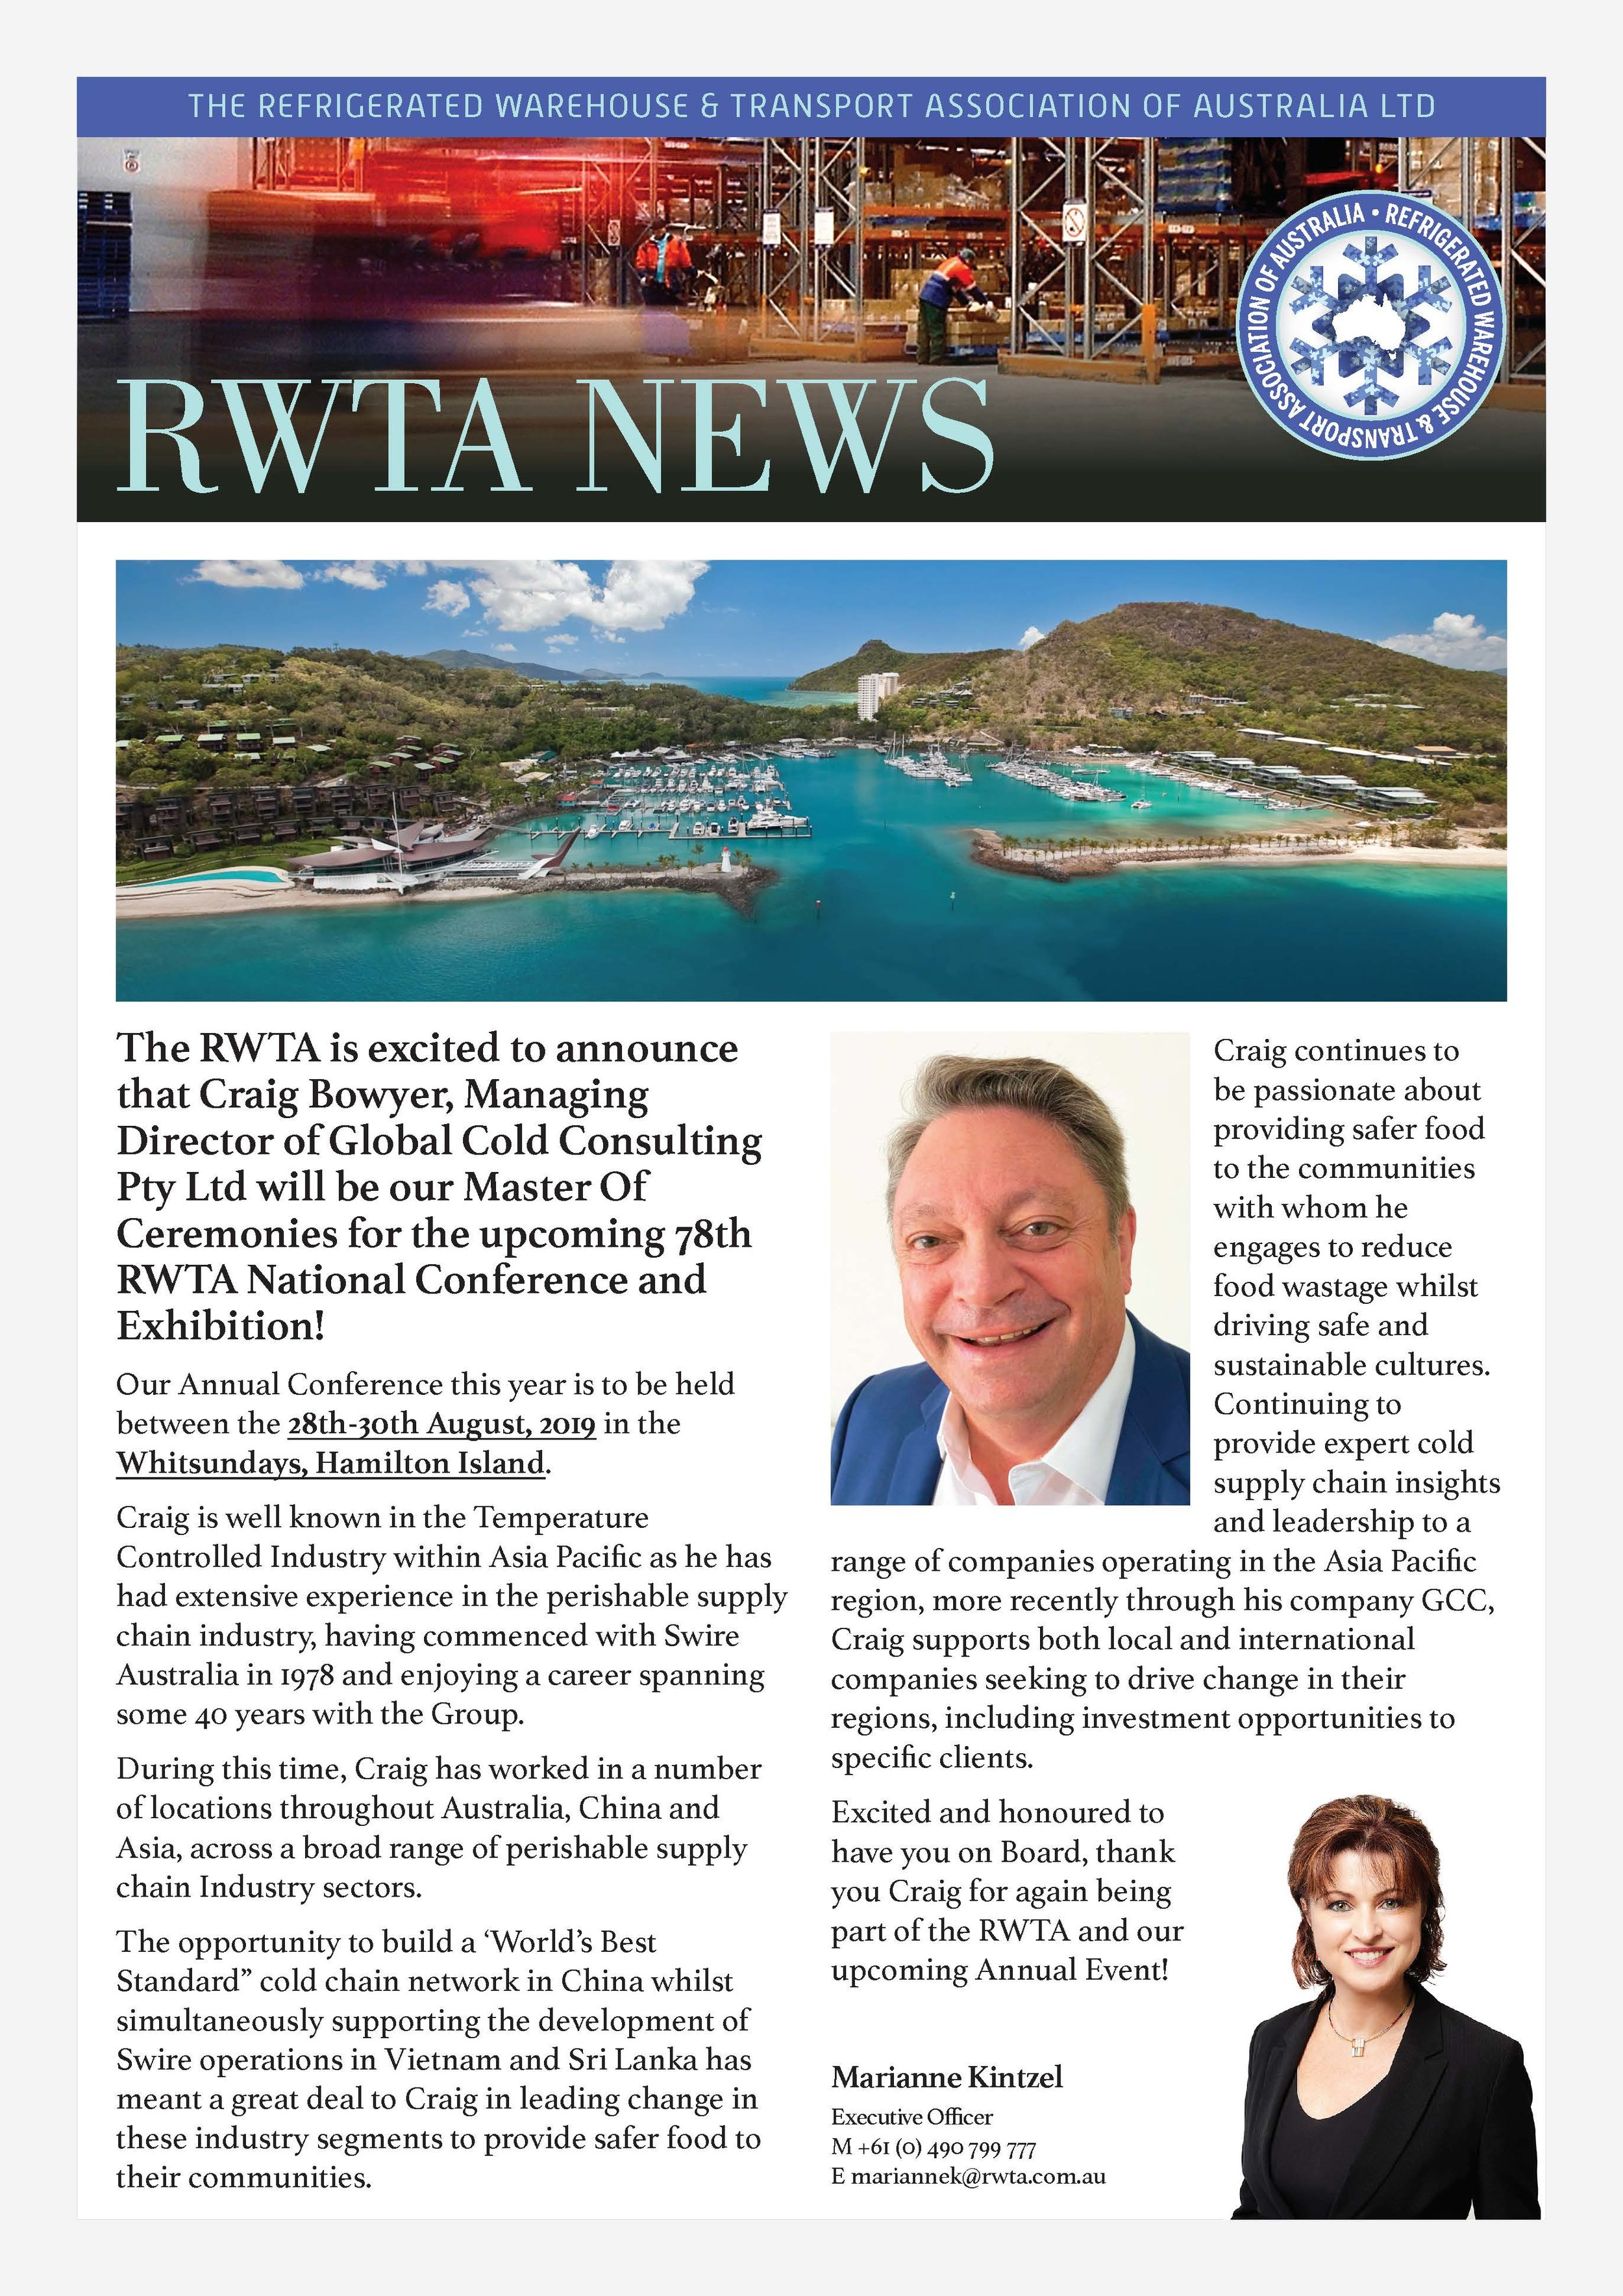 12468_RWTA_Welcome Criag Bowyer_F.jpg